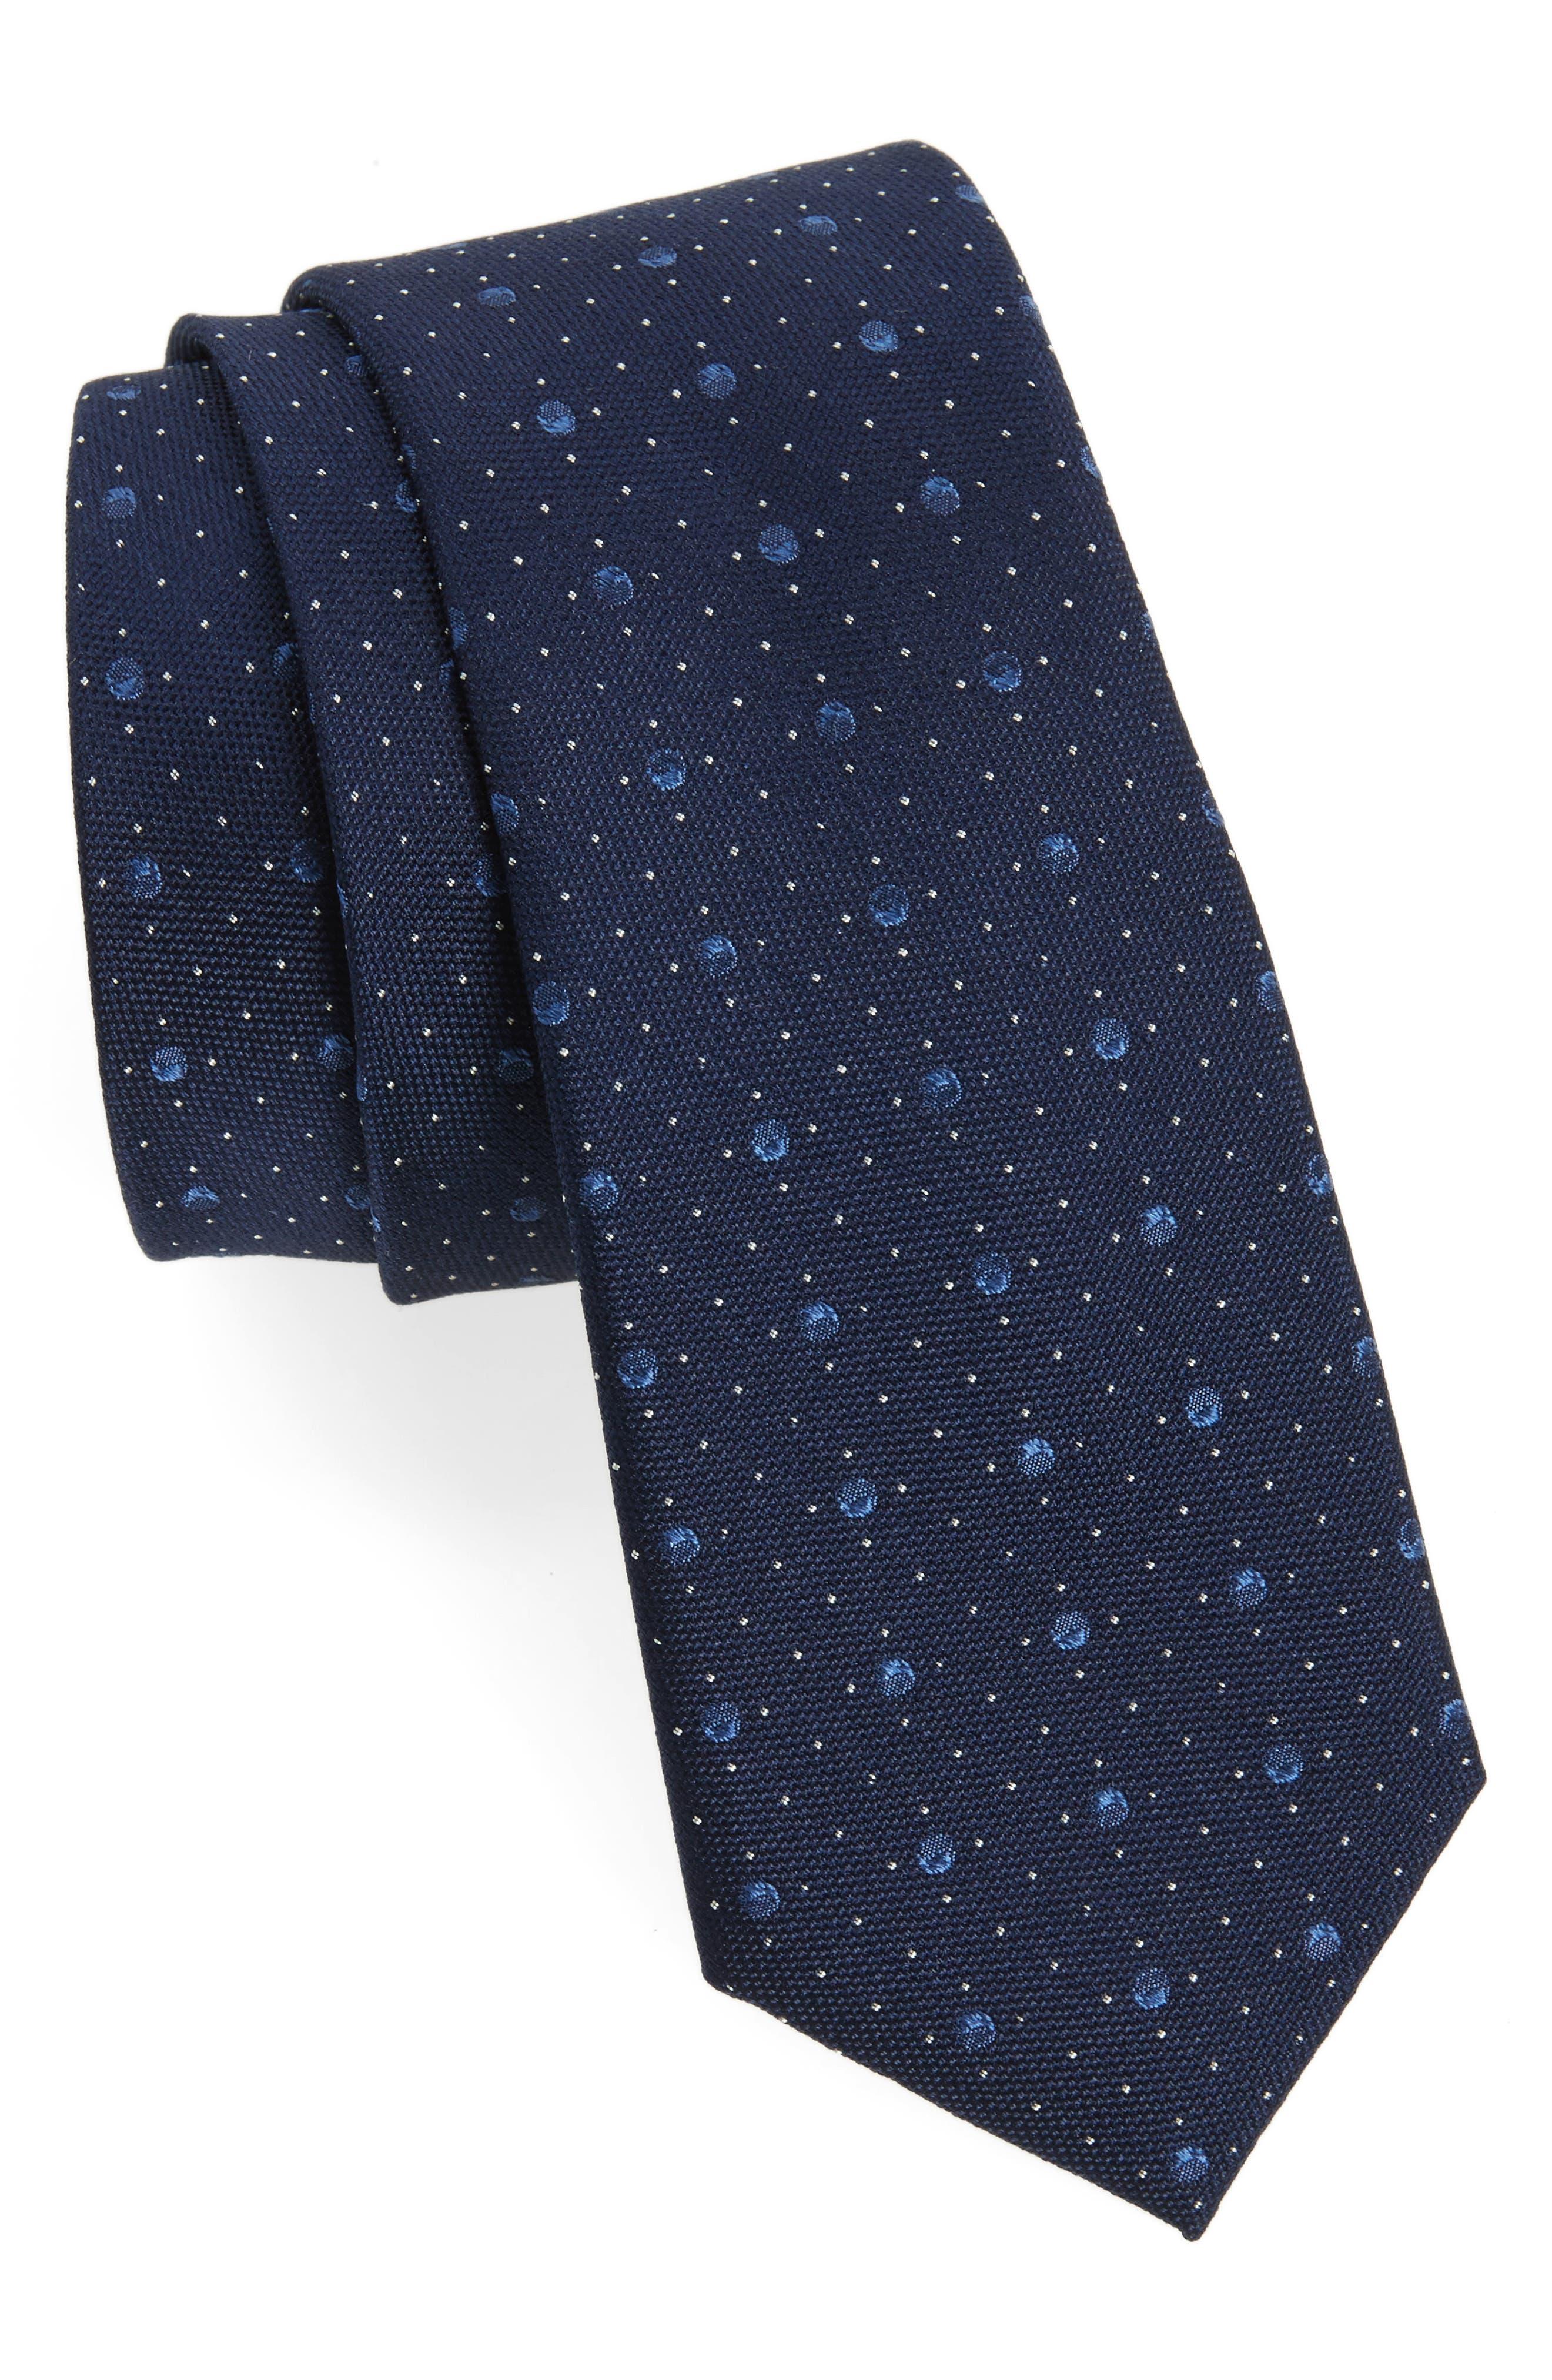 3D Dot Silk Tie,                         Main,                         color, 411